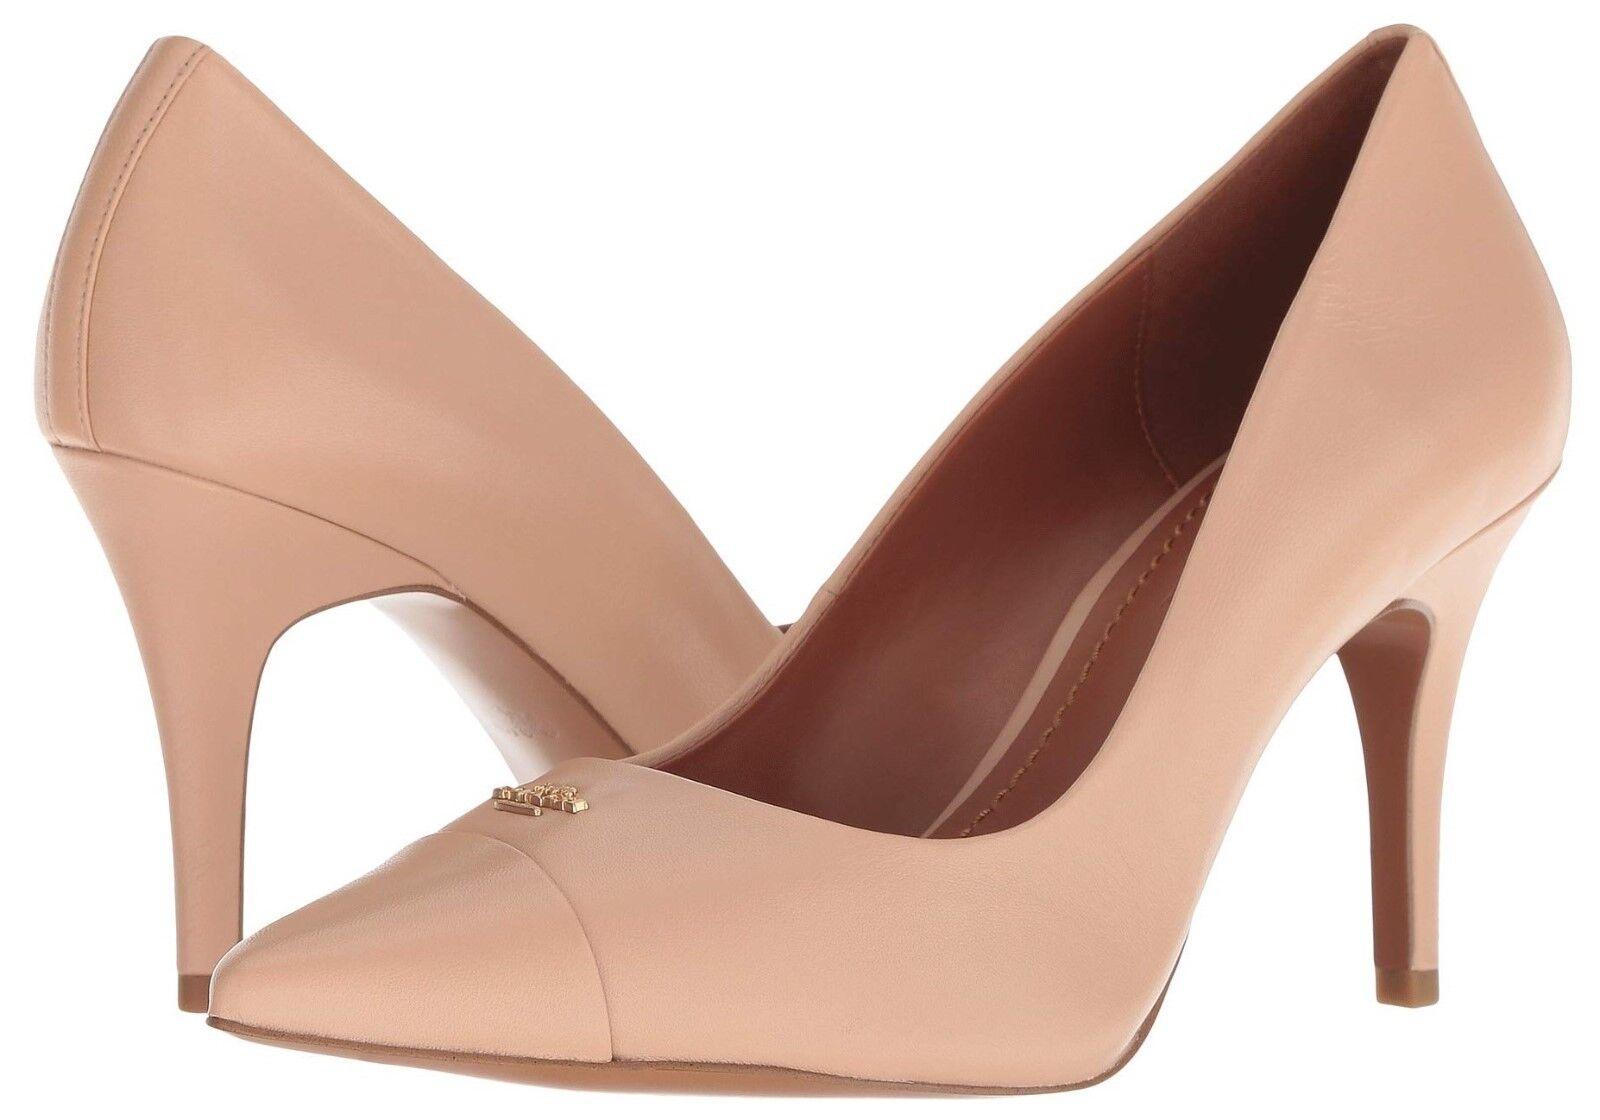 COACH Patrice Leather Pump Women's Pumps Heels Casual Dress Classic Shoes NIB